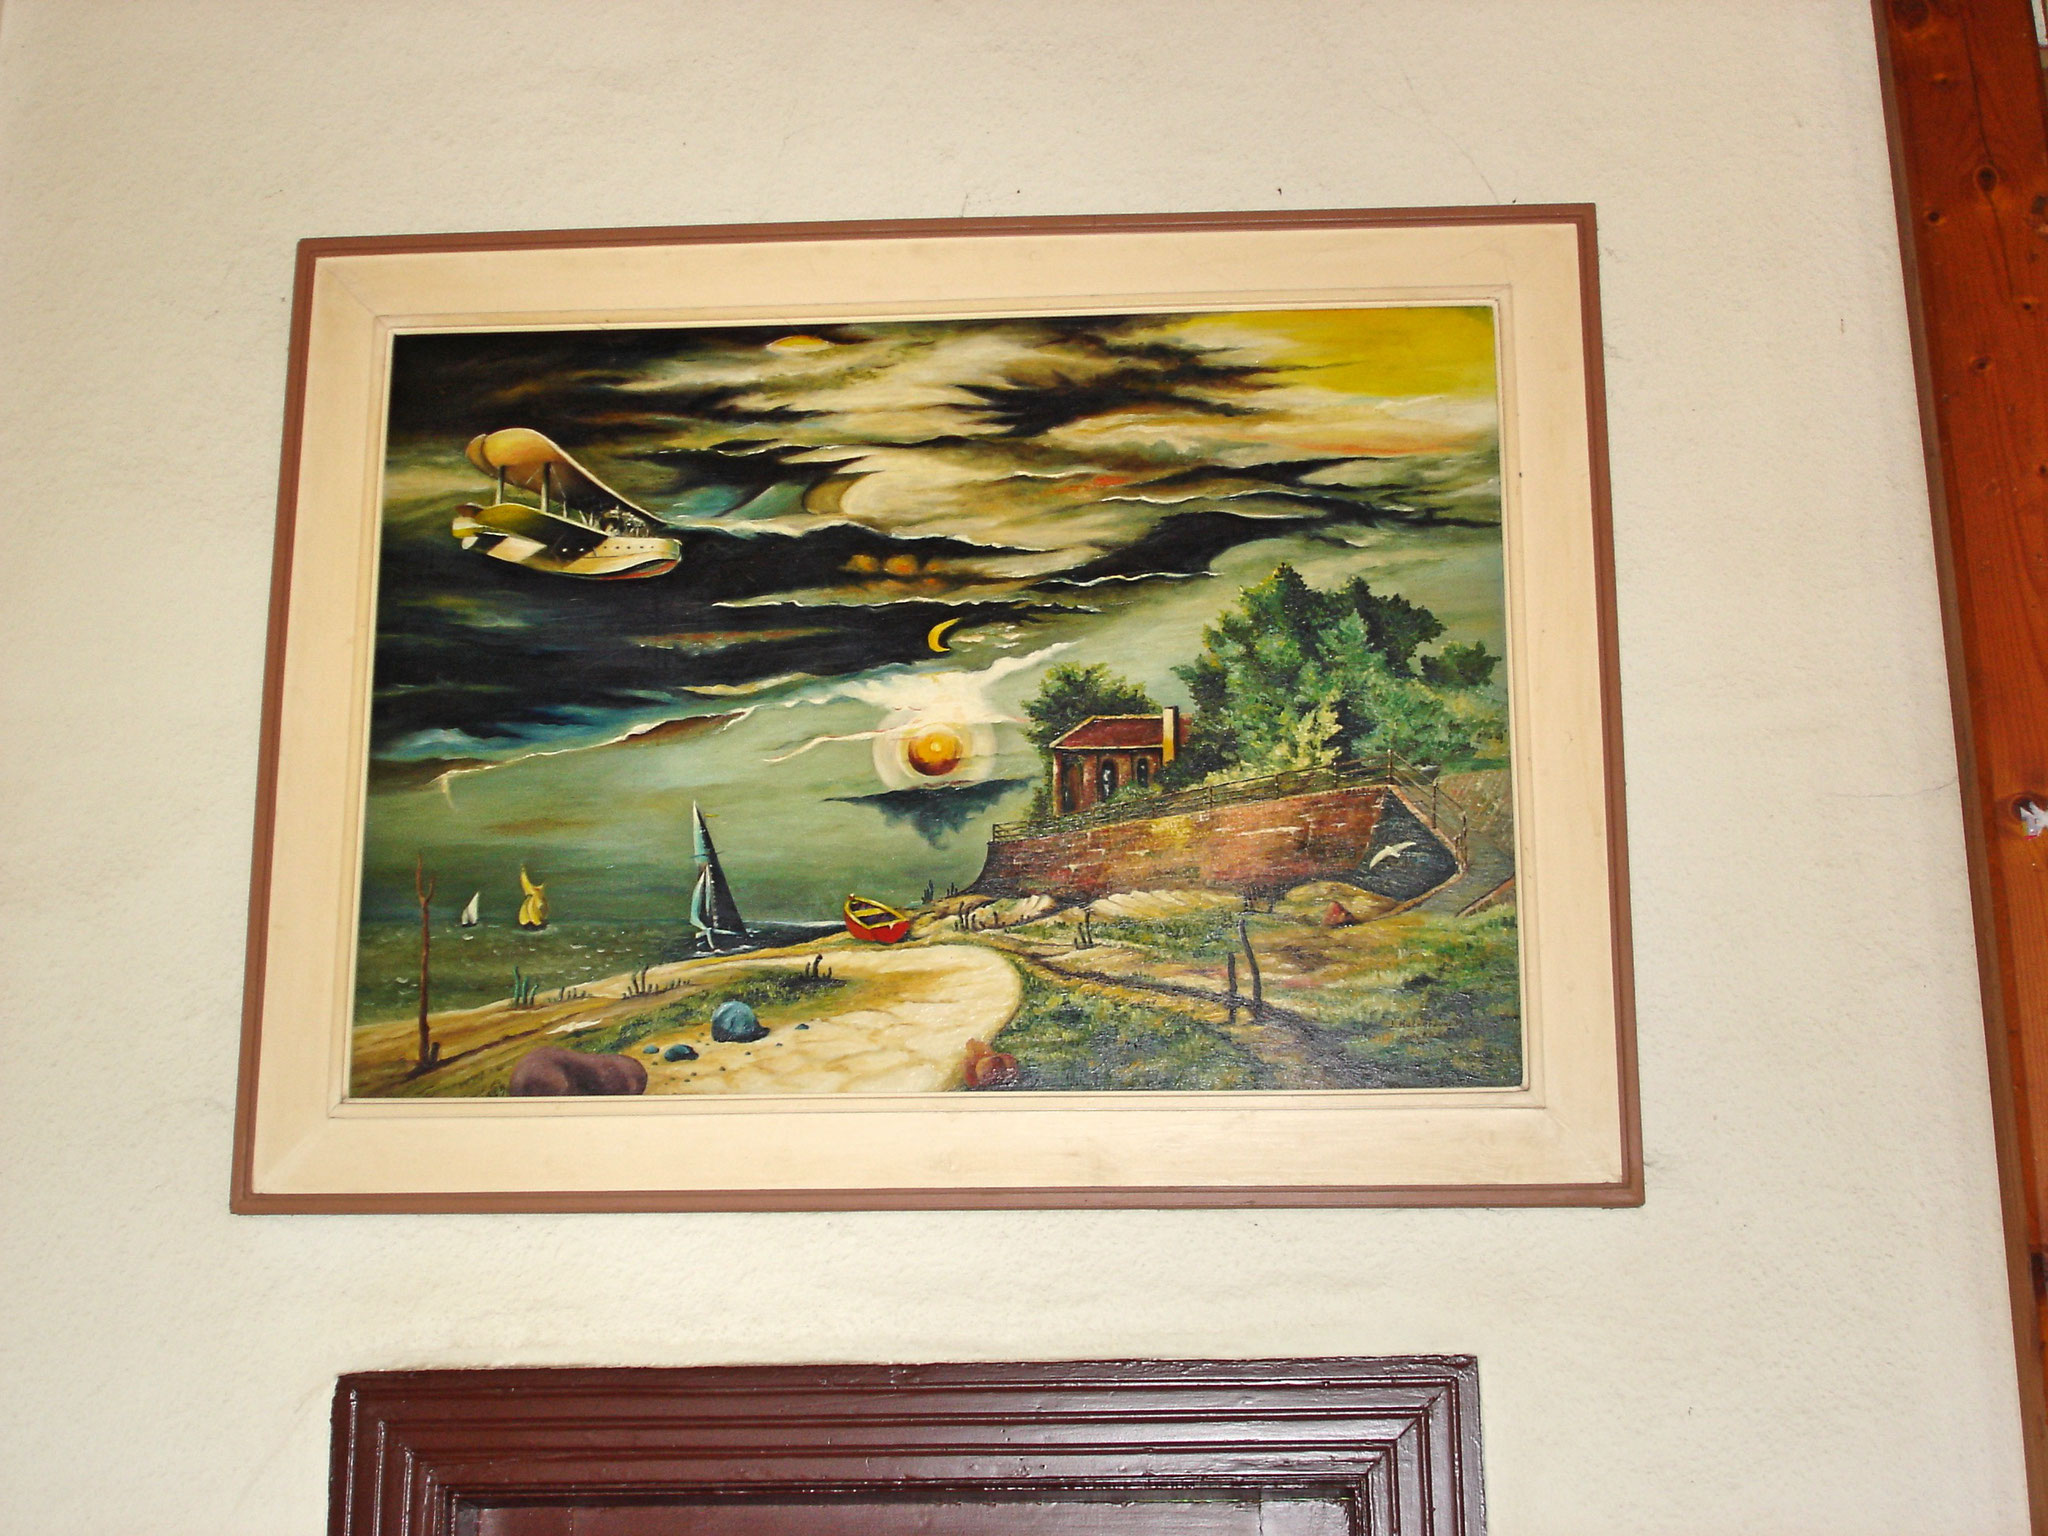 Franz Radziwill, Strand von Dangast mit Flugboot, Kurhaus Dangast